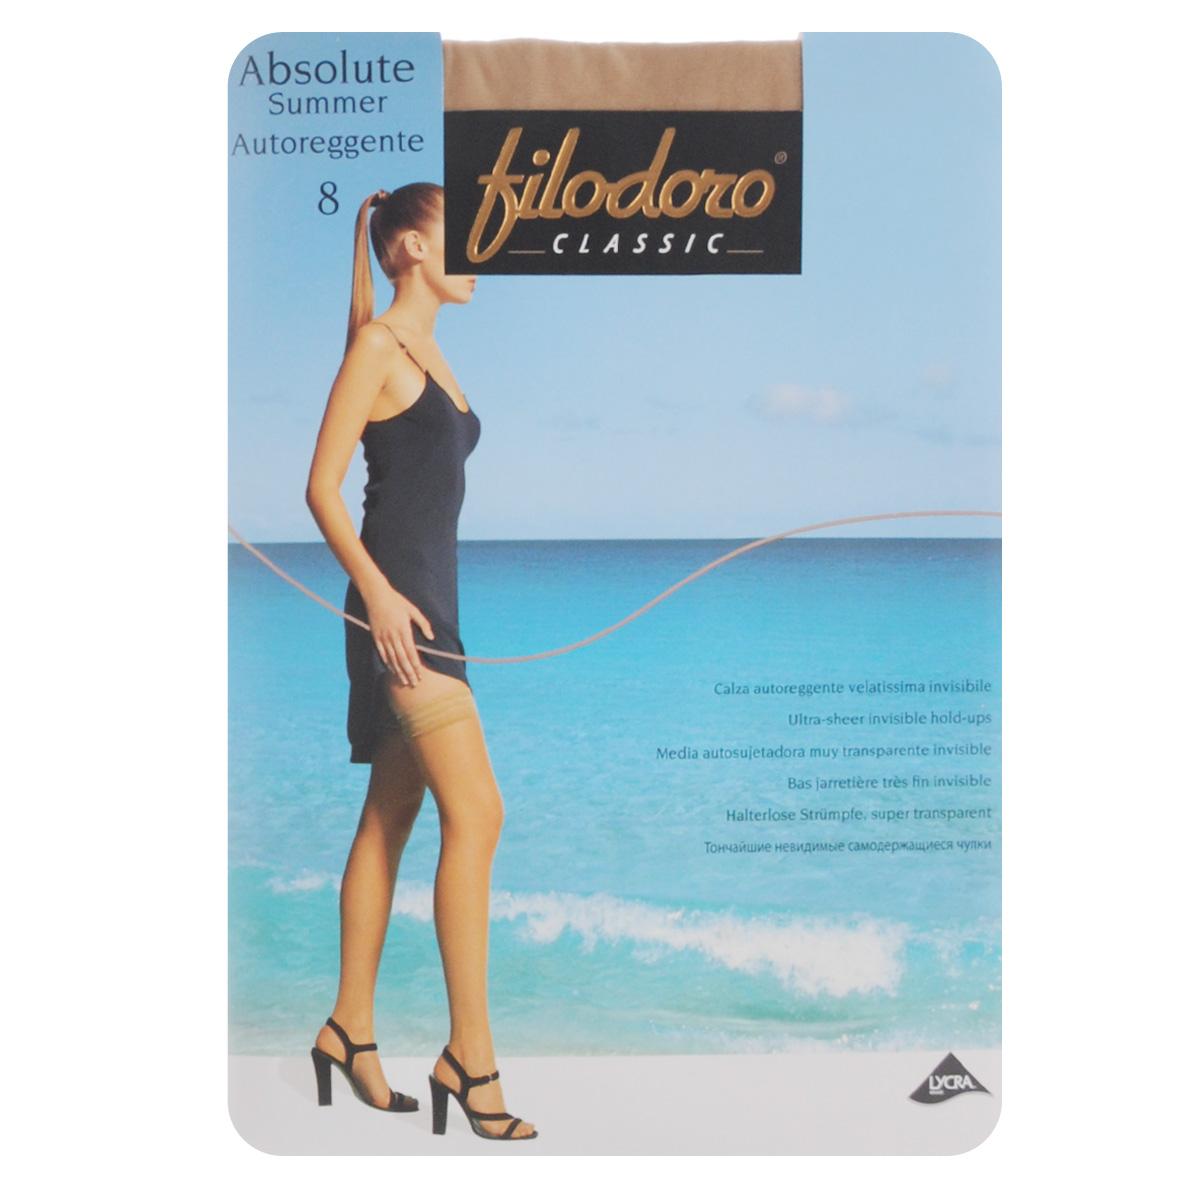 Чулки Filodoro Classic Absolute Summer Autoreggente